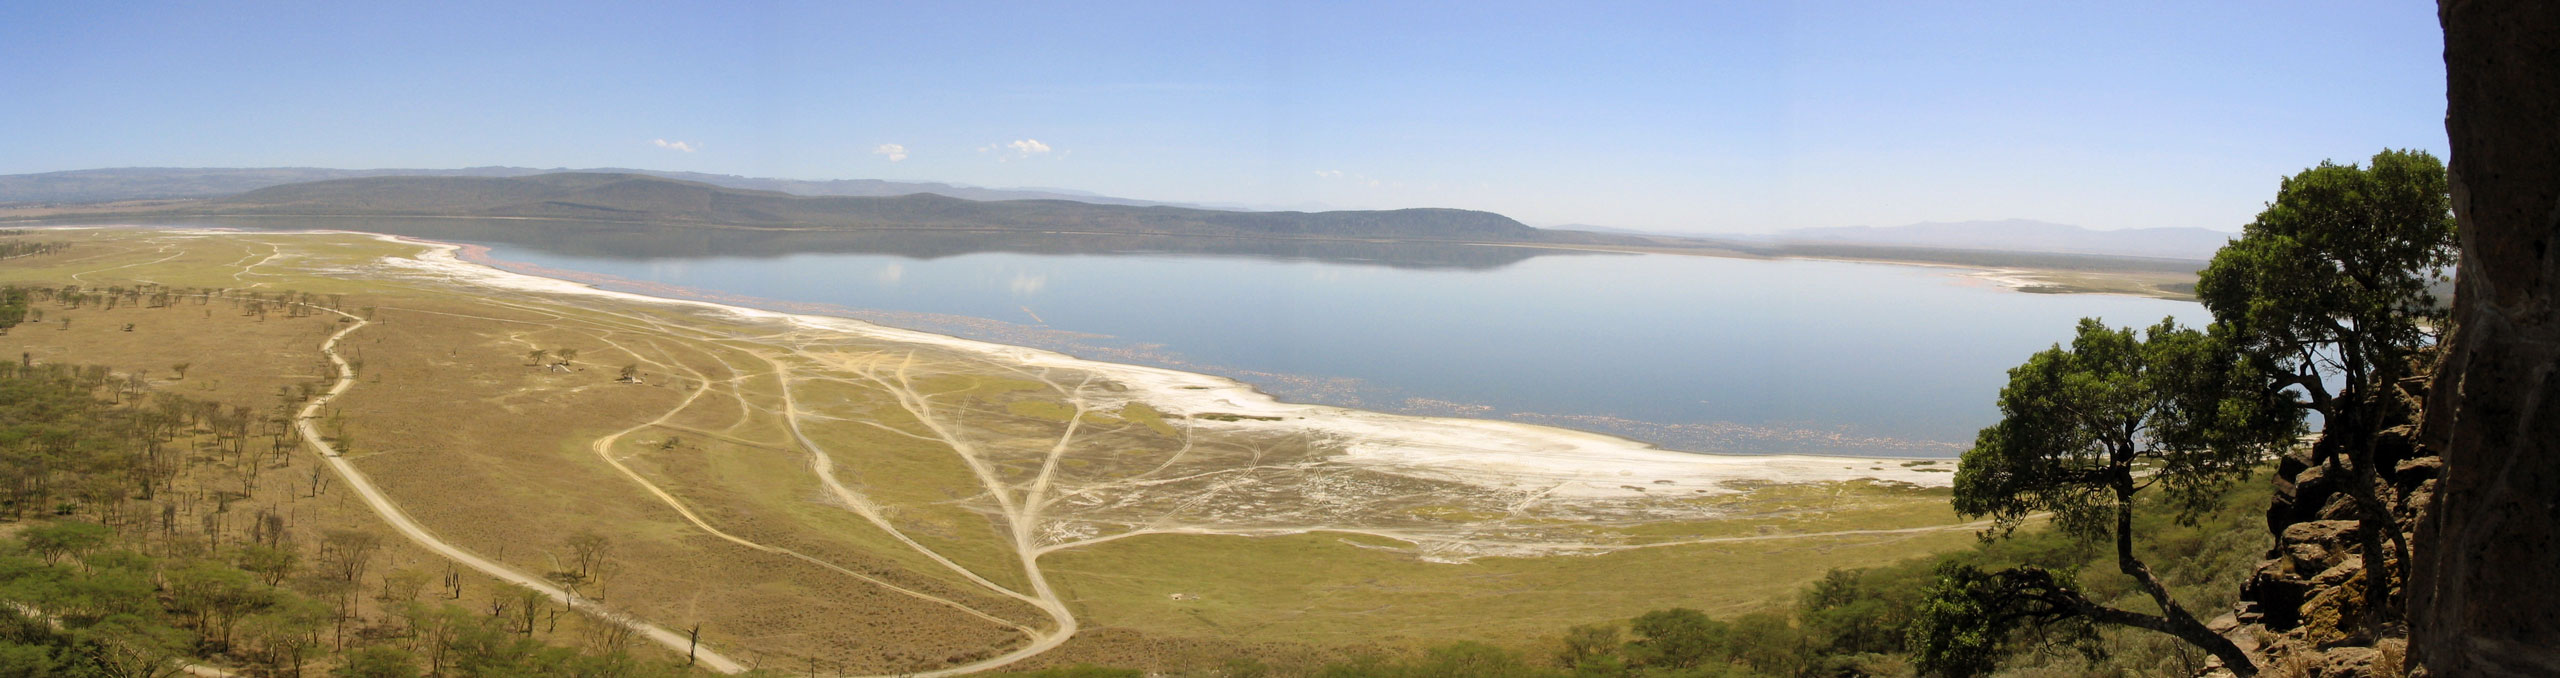 Büyük Rift Vadisi